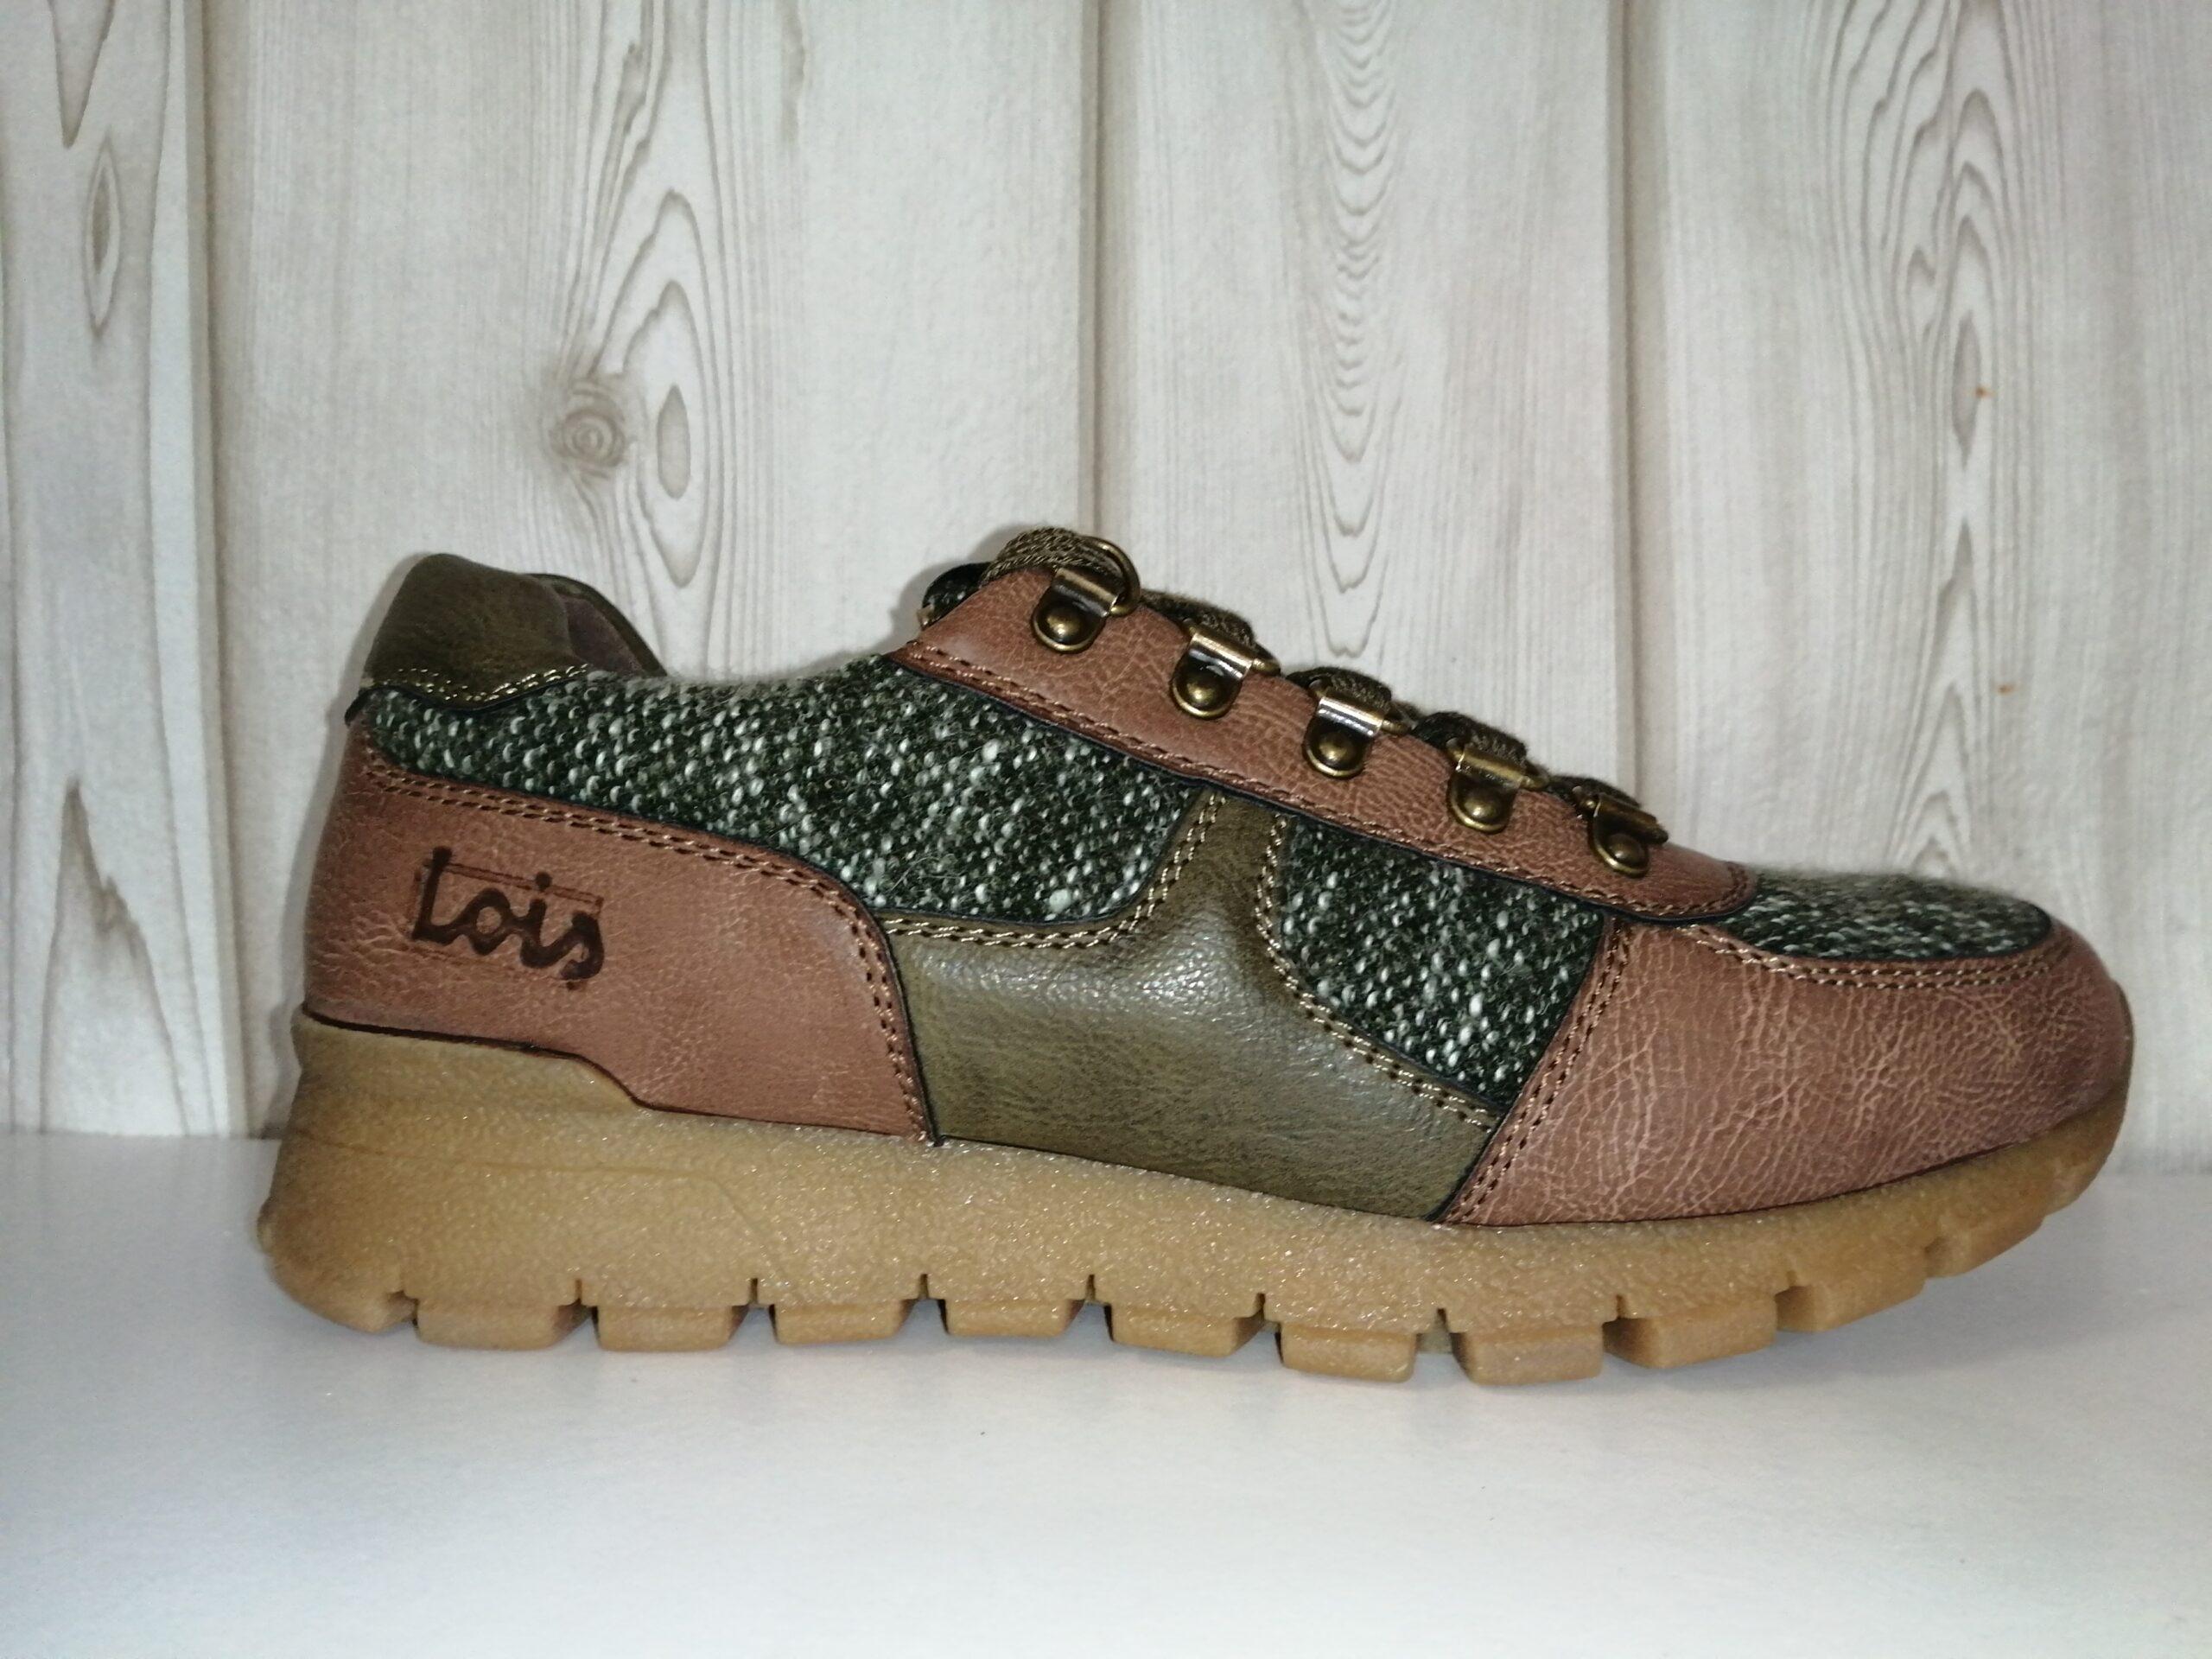 Zapato casual cordones camel/verde sra 85233LOIS